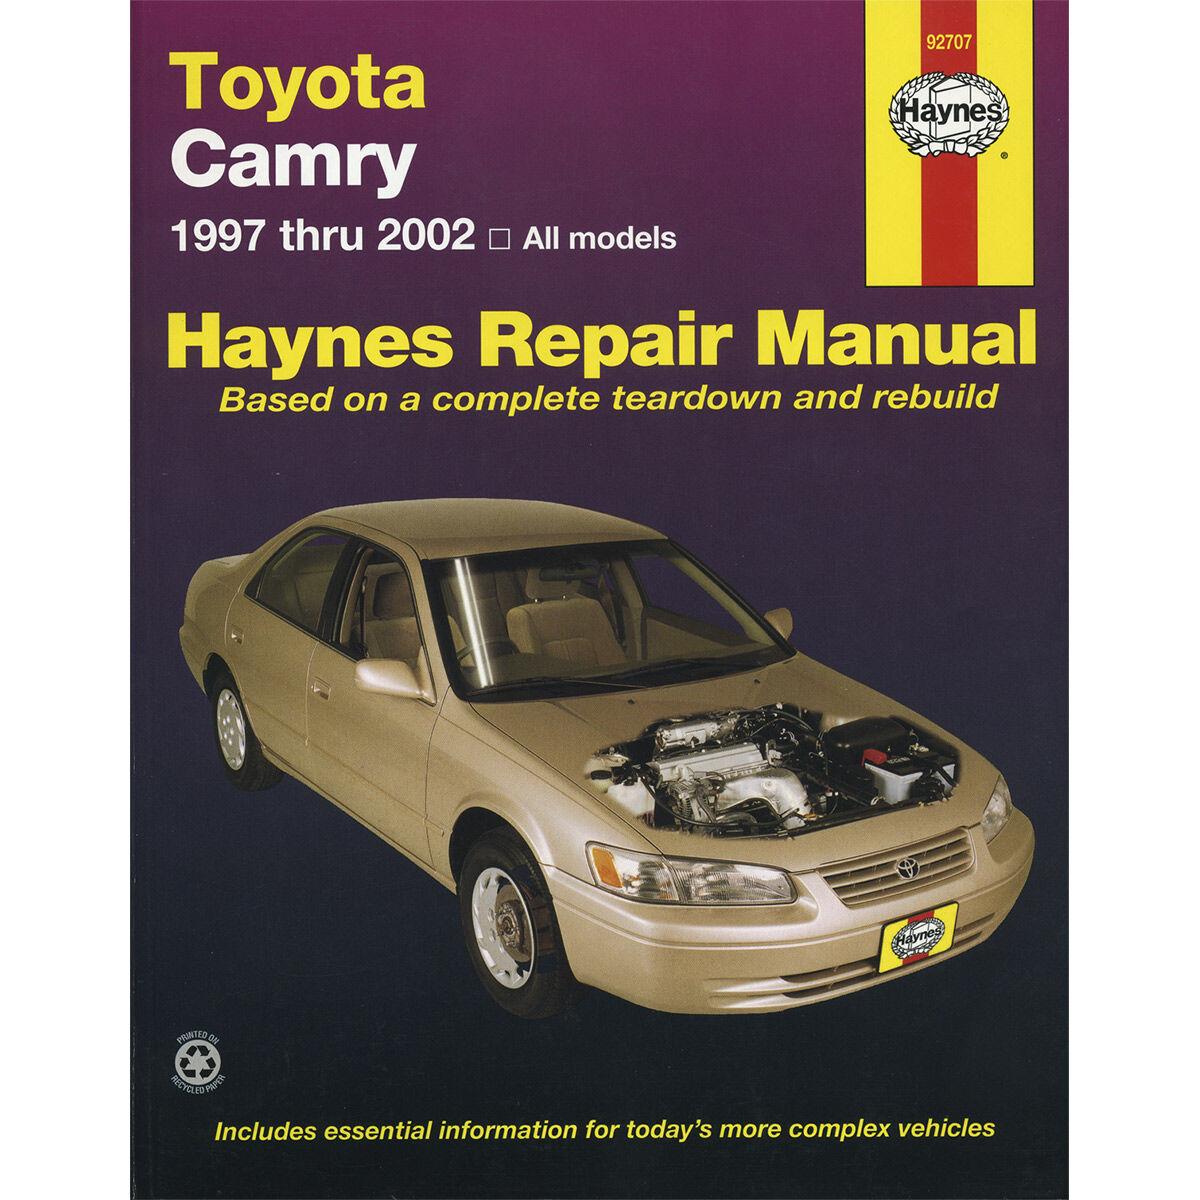 haynes car manual for toyota camry 1997 2002 92707 supercheap rh  supercheapauto co nz toyota camry 1997 service manual ...